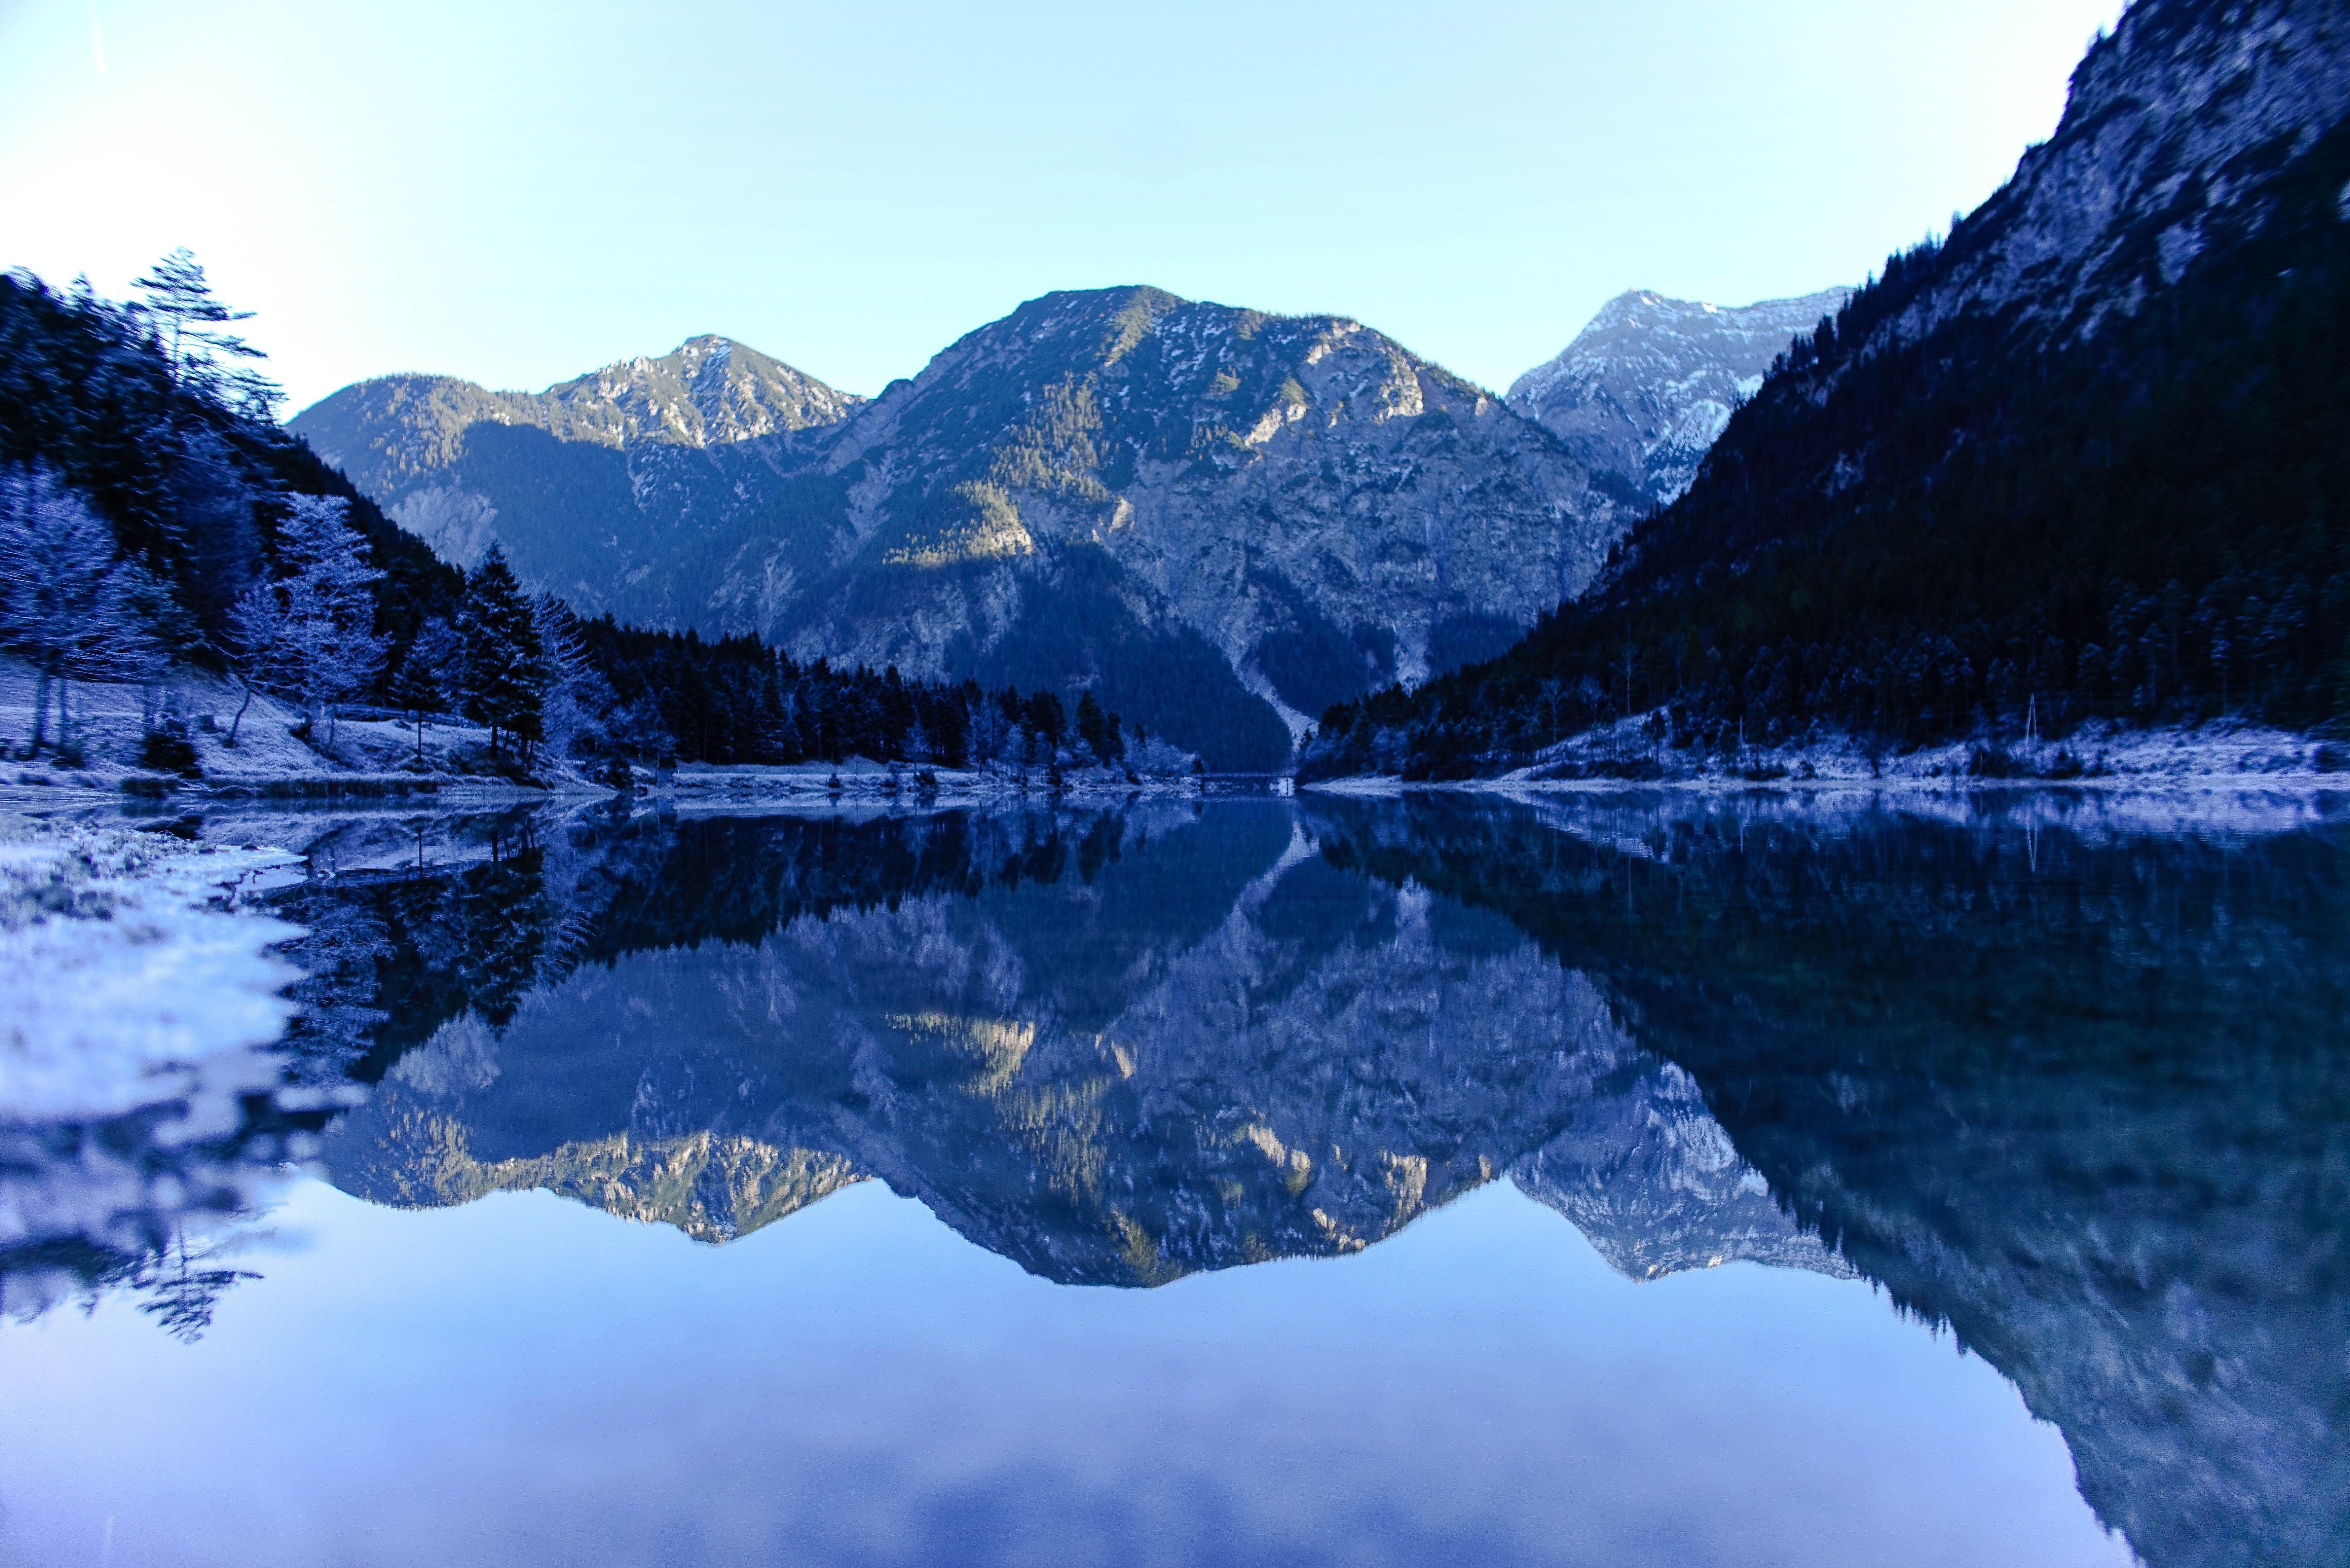 reflection of trees in lake  u00b7 free stock photo